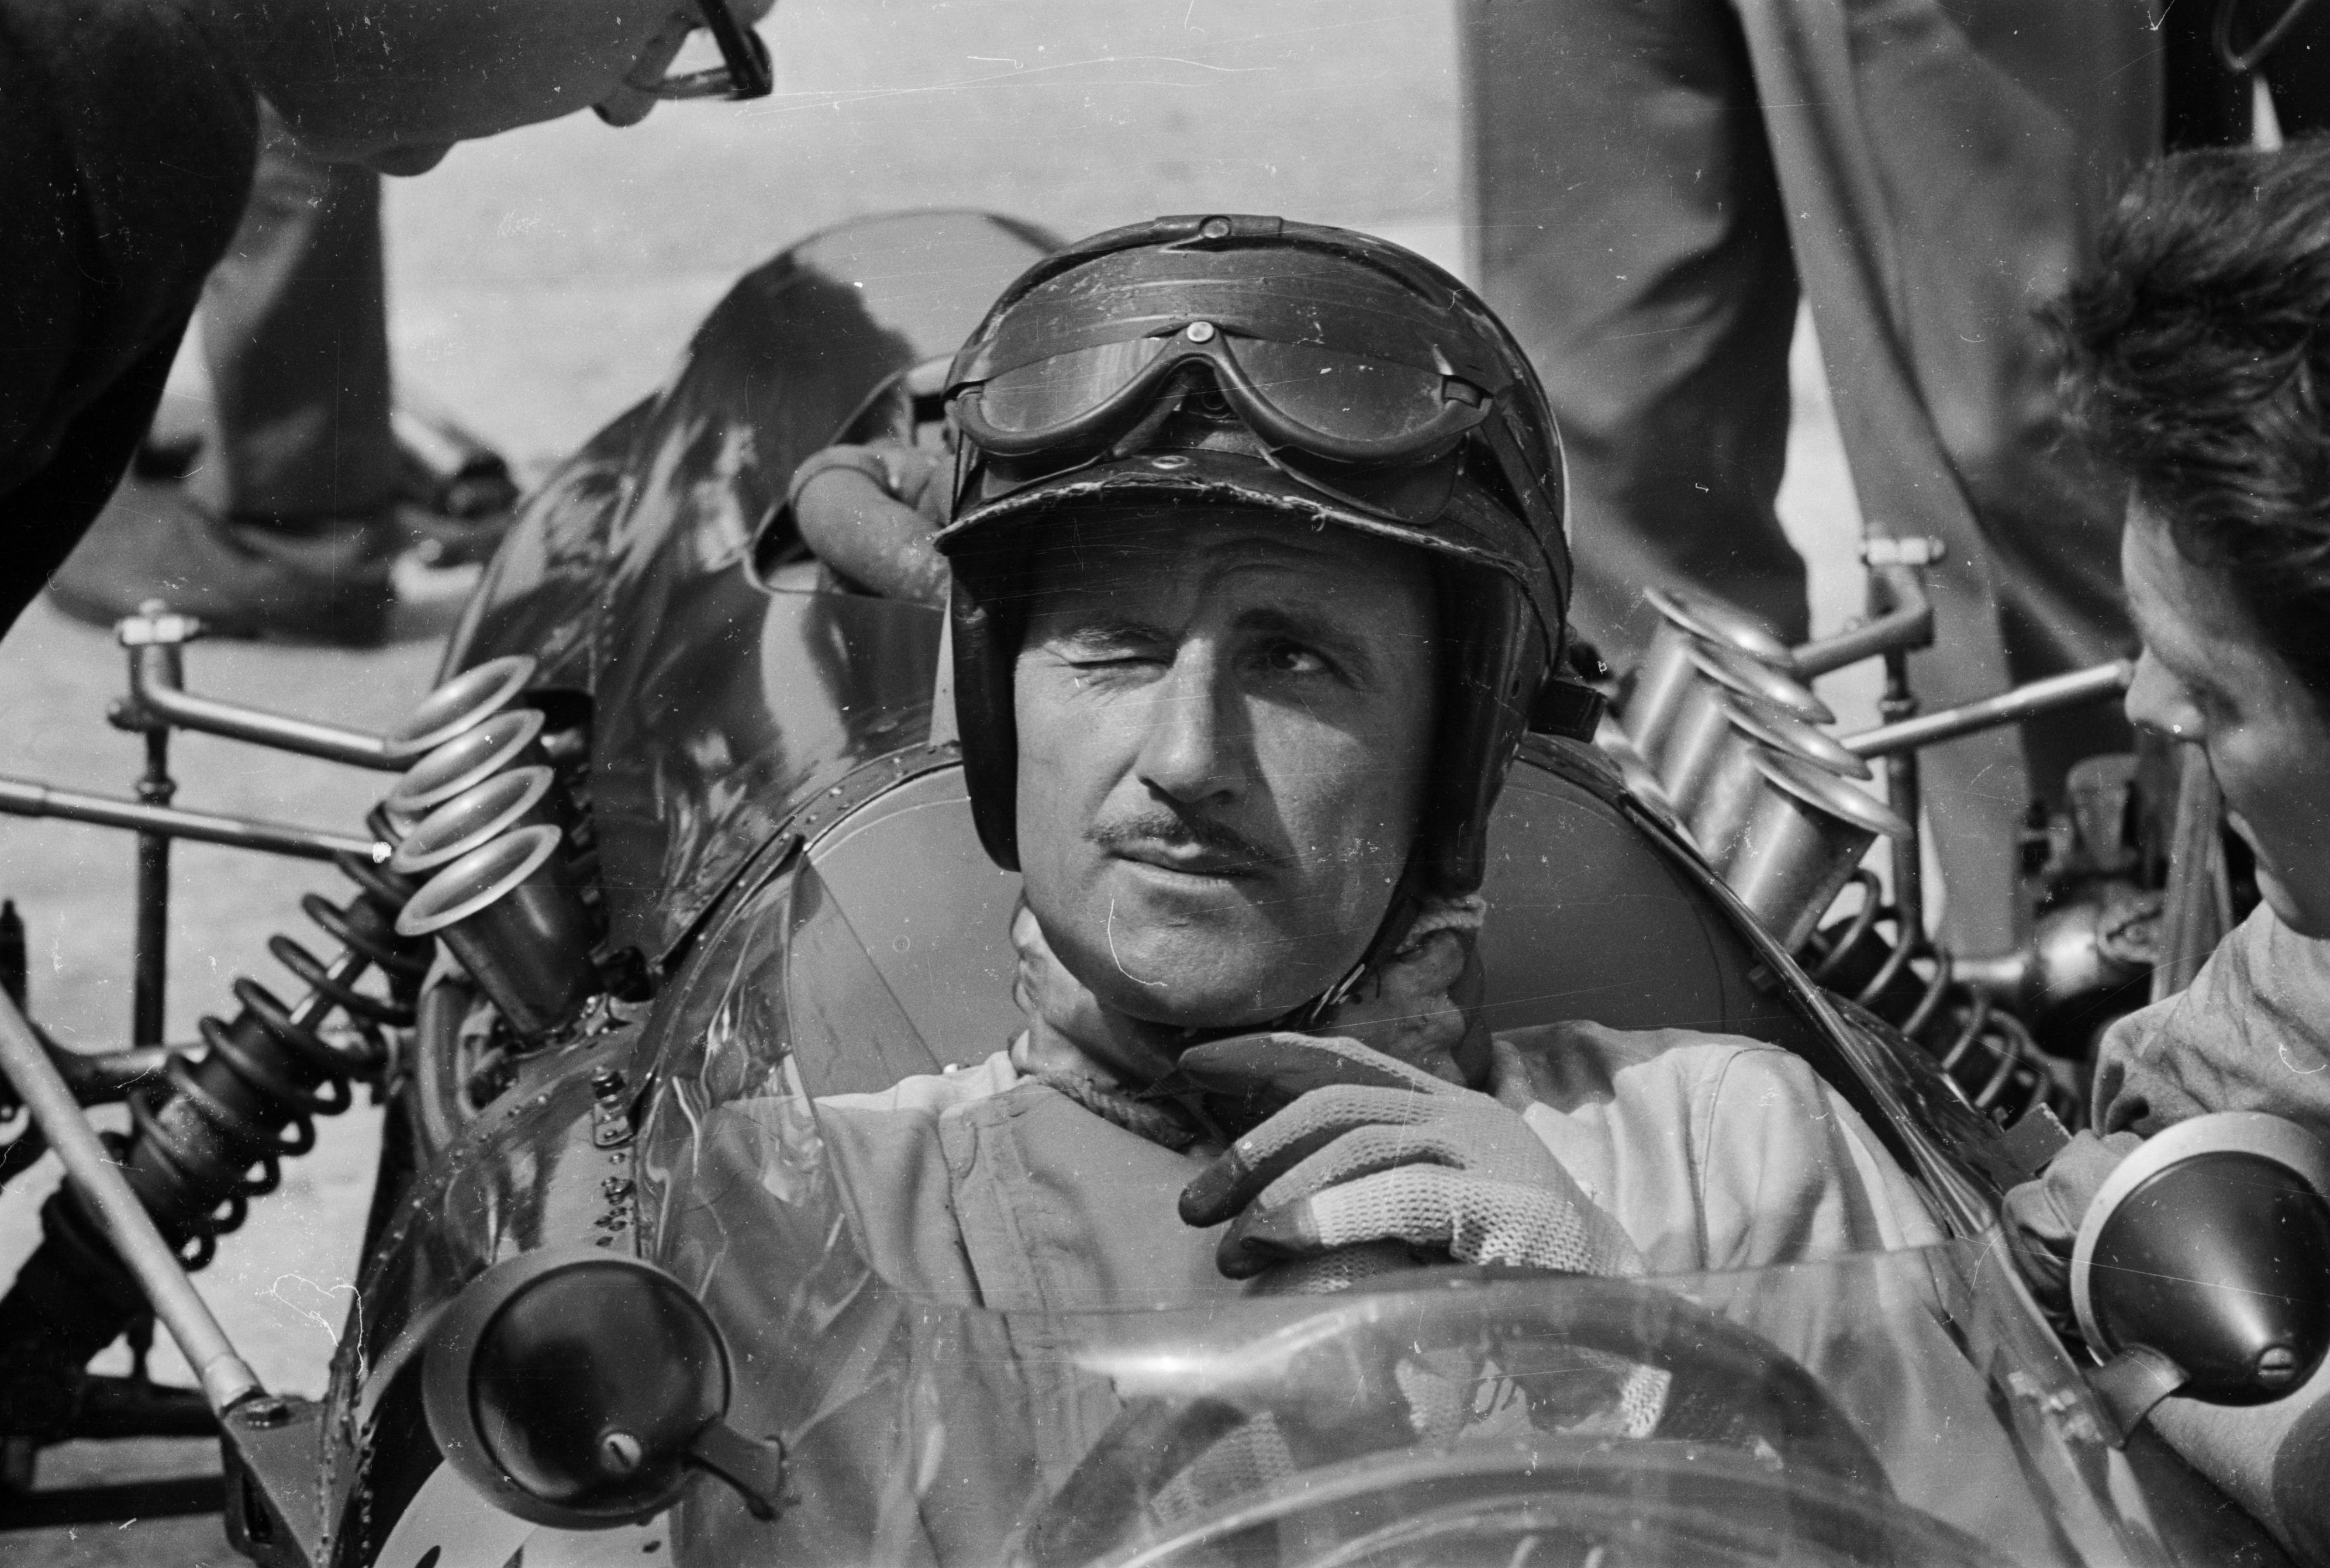 Graham Hill won Monaco GP, Le Mans 24 hours race and Indy 500